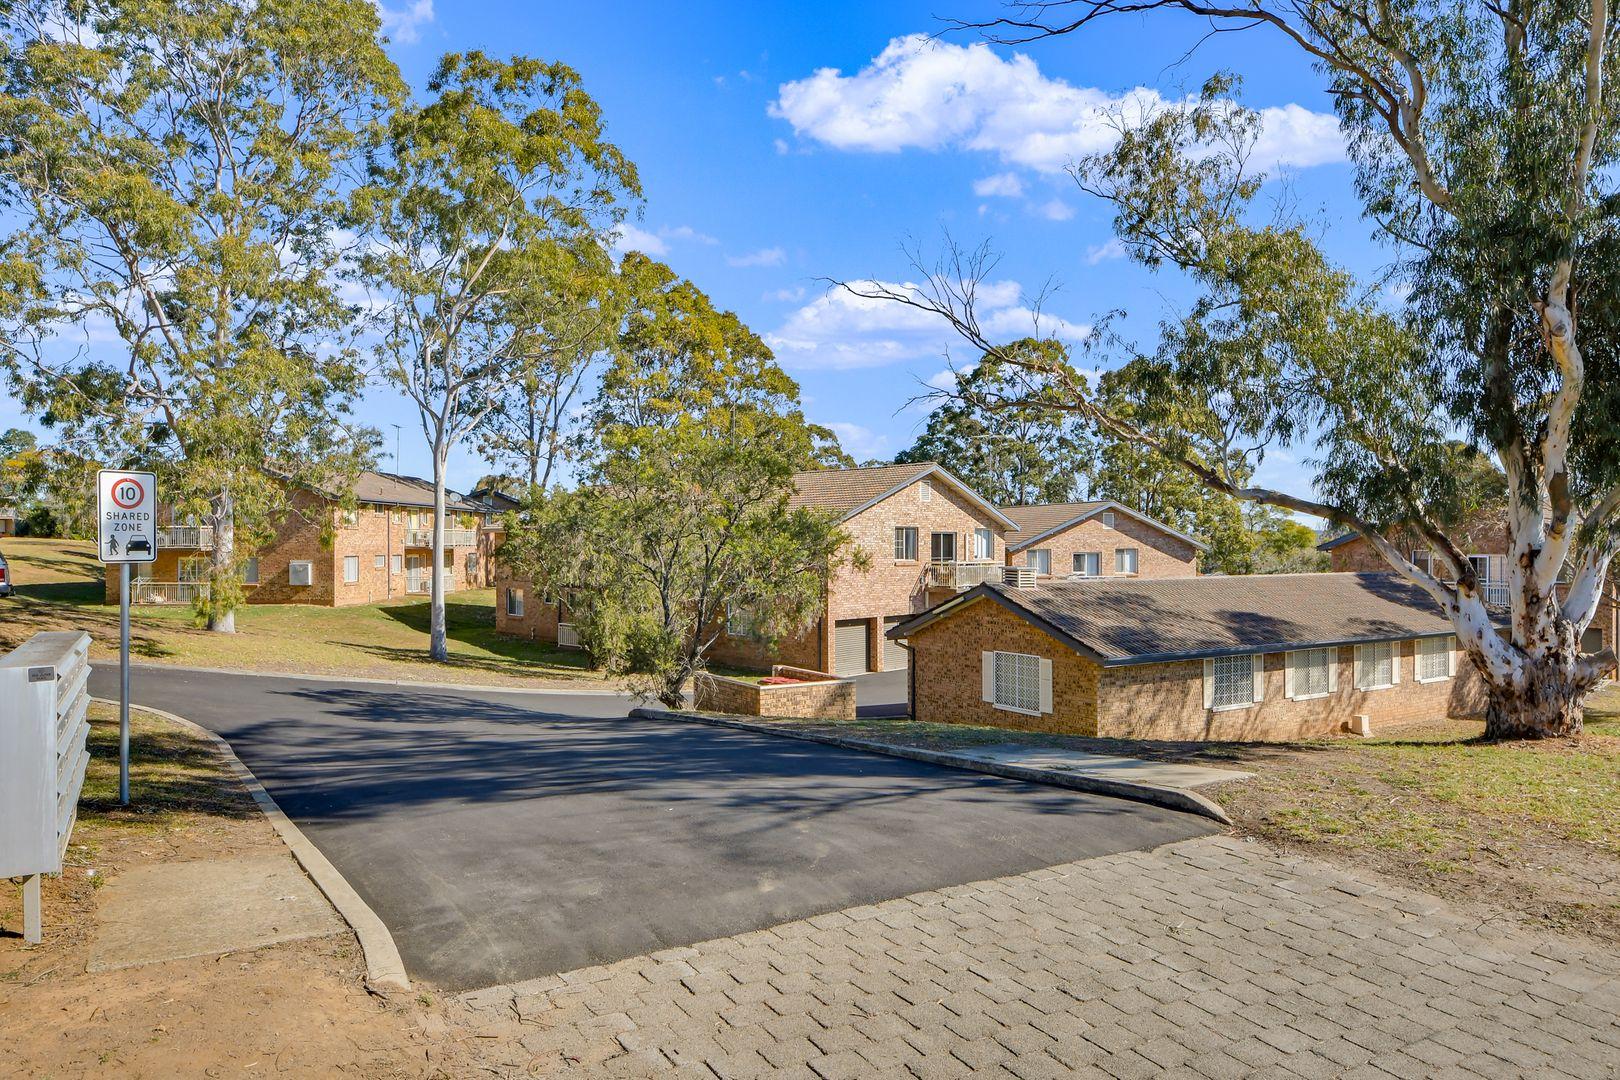 50/100 Burrinjuck Street, Leumeah NSW 2560, Image 1